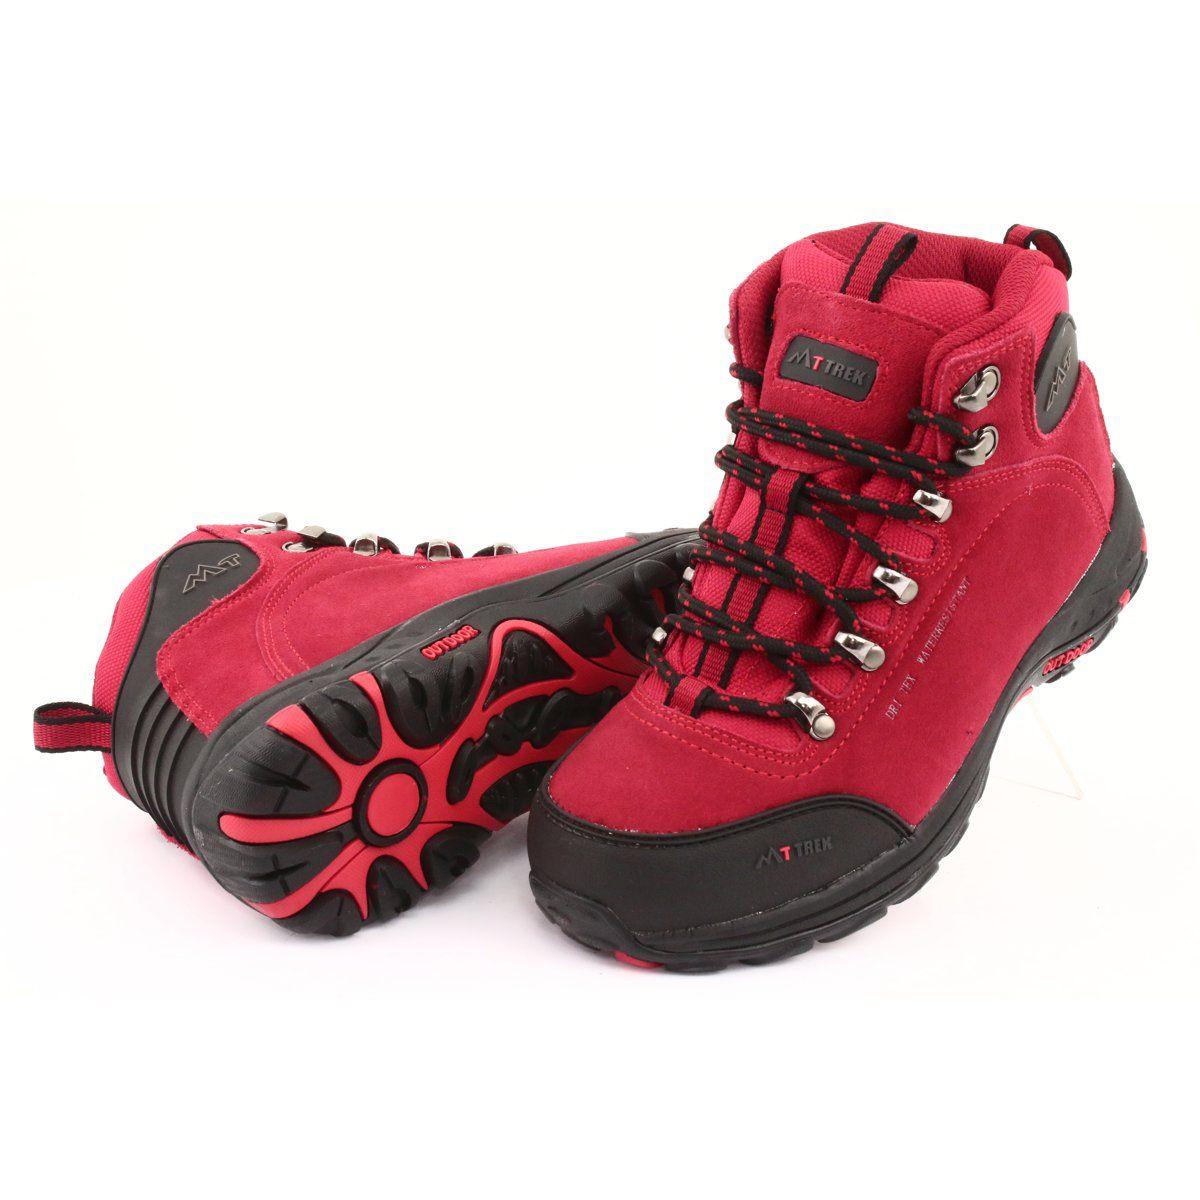 Trapery Z Membrana Mttrek 034 Red Czarne Czerwone Black And Red Trekking Shoes Hiking Boots